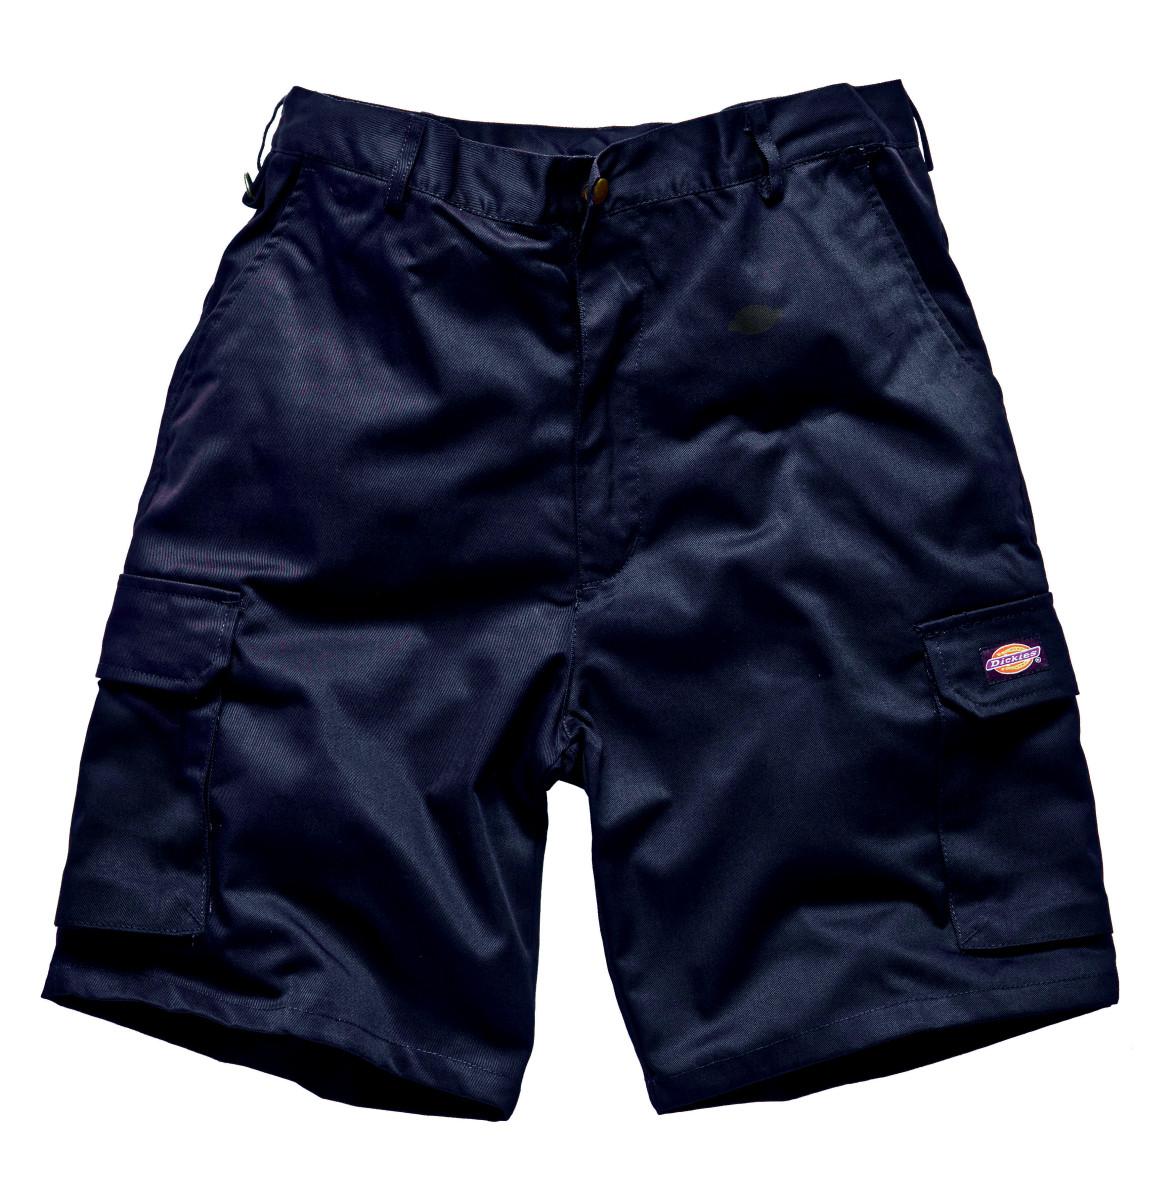 Redhawk Cargo Shorts